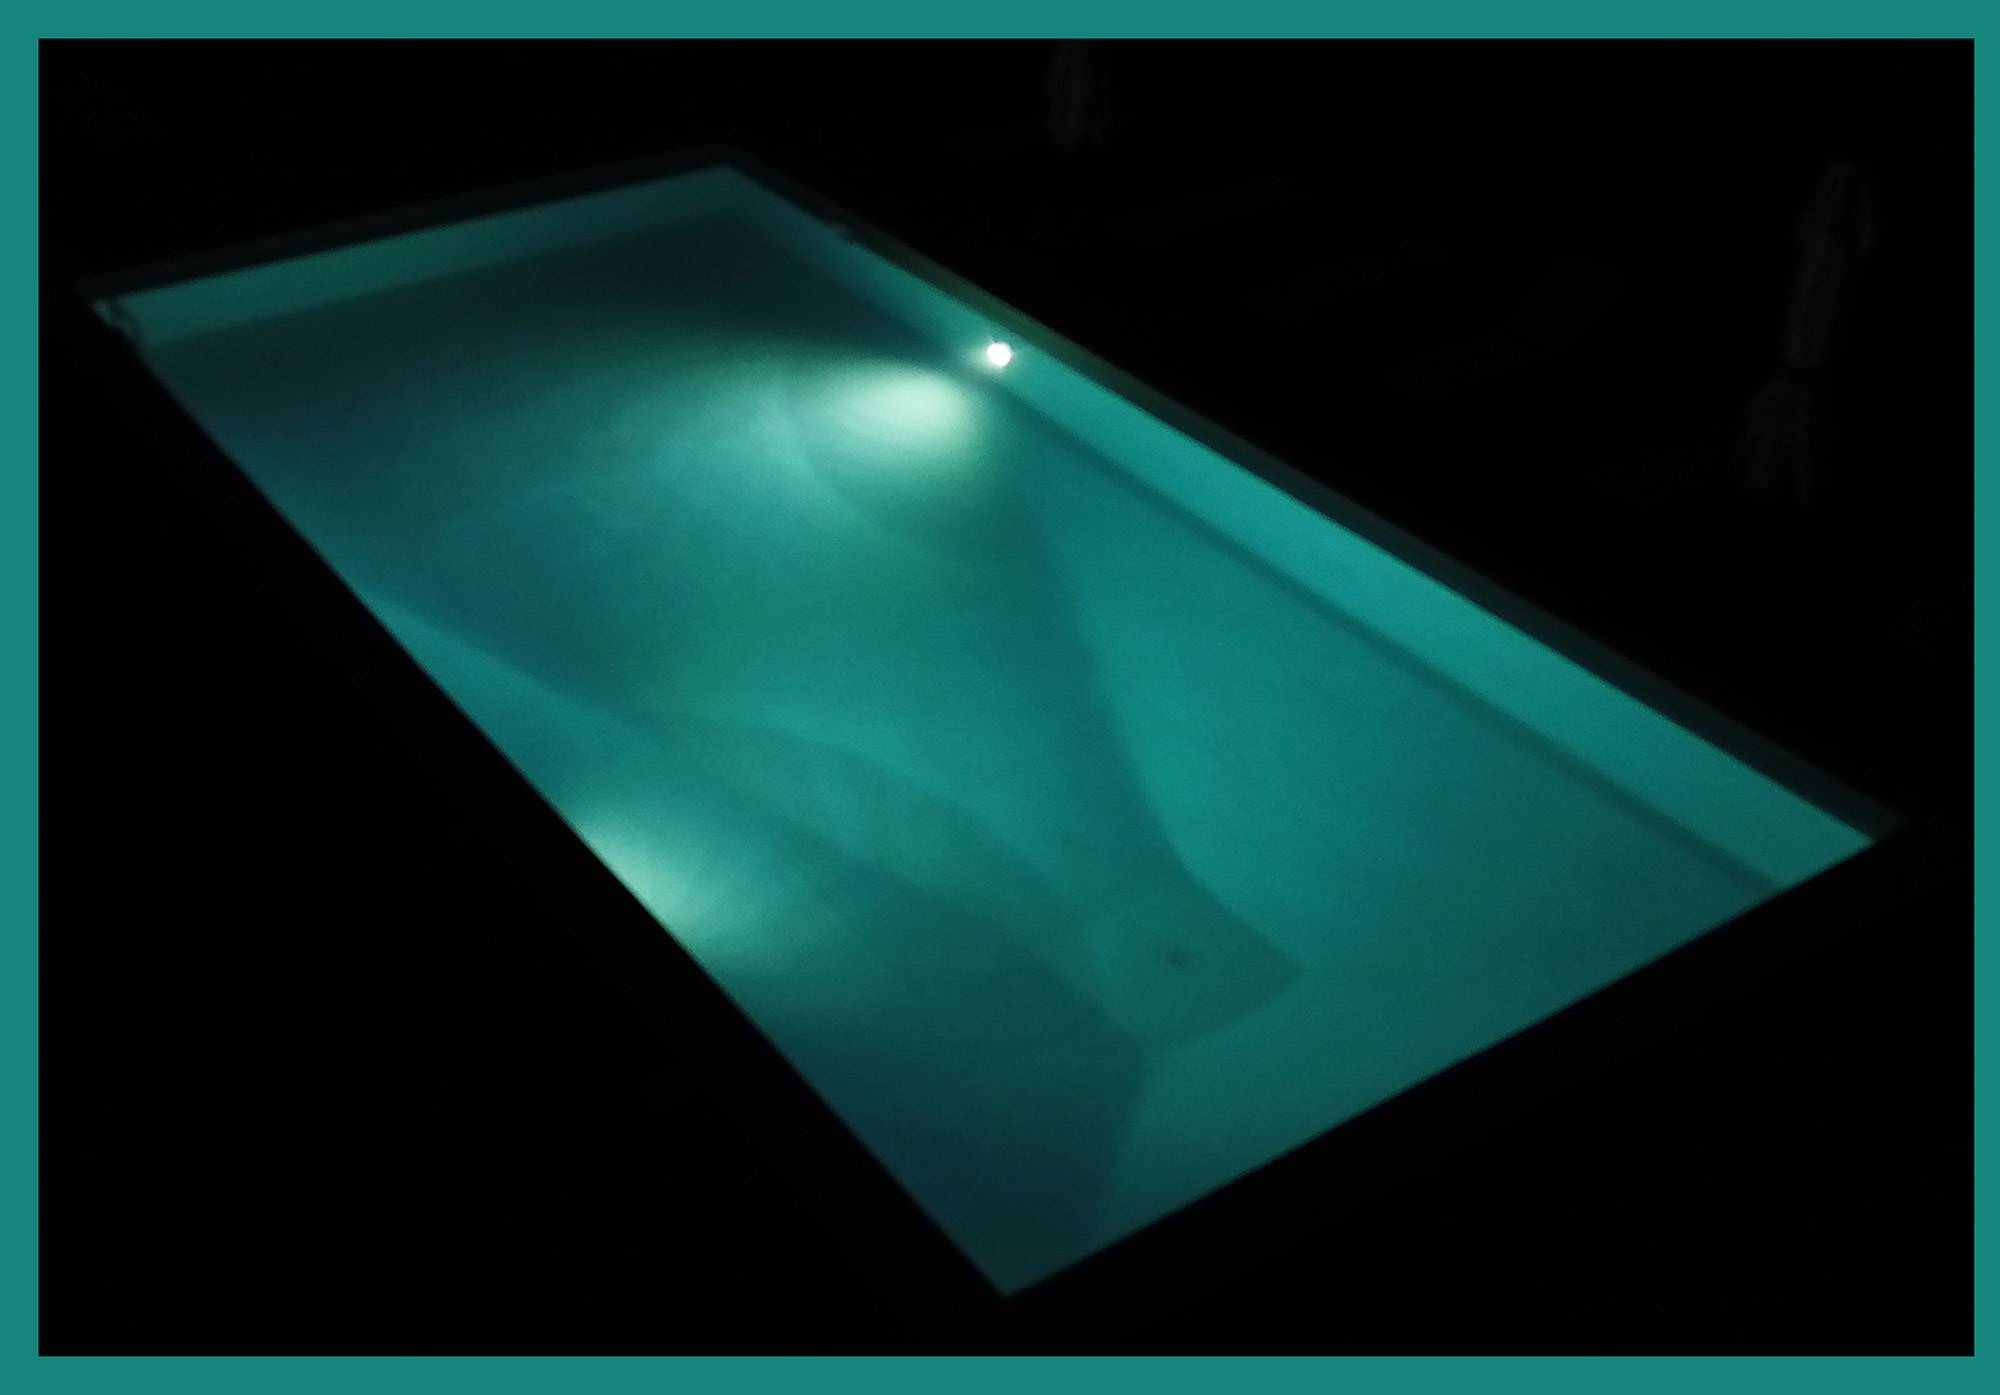 villa tuscany exlusive pool illuminated in the night